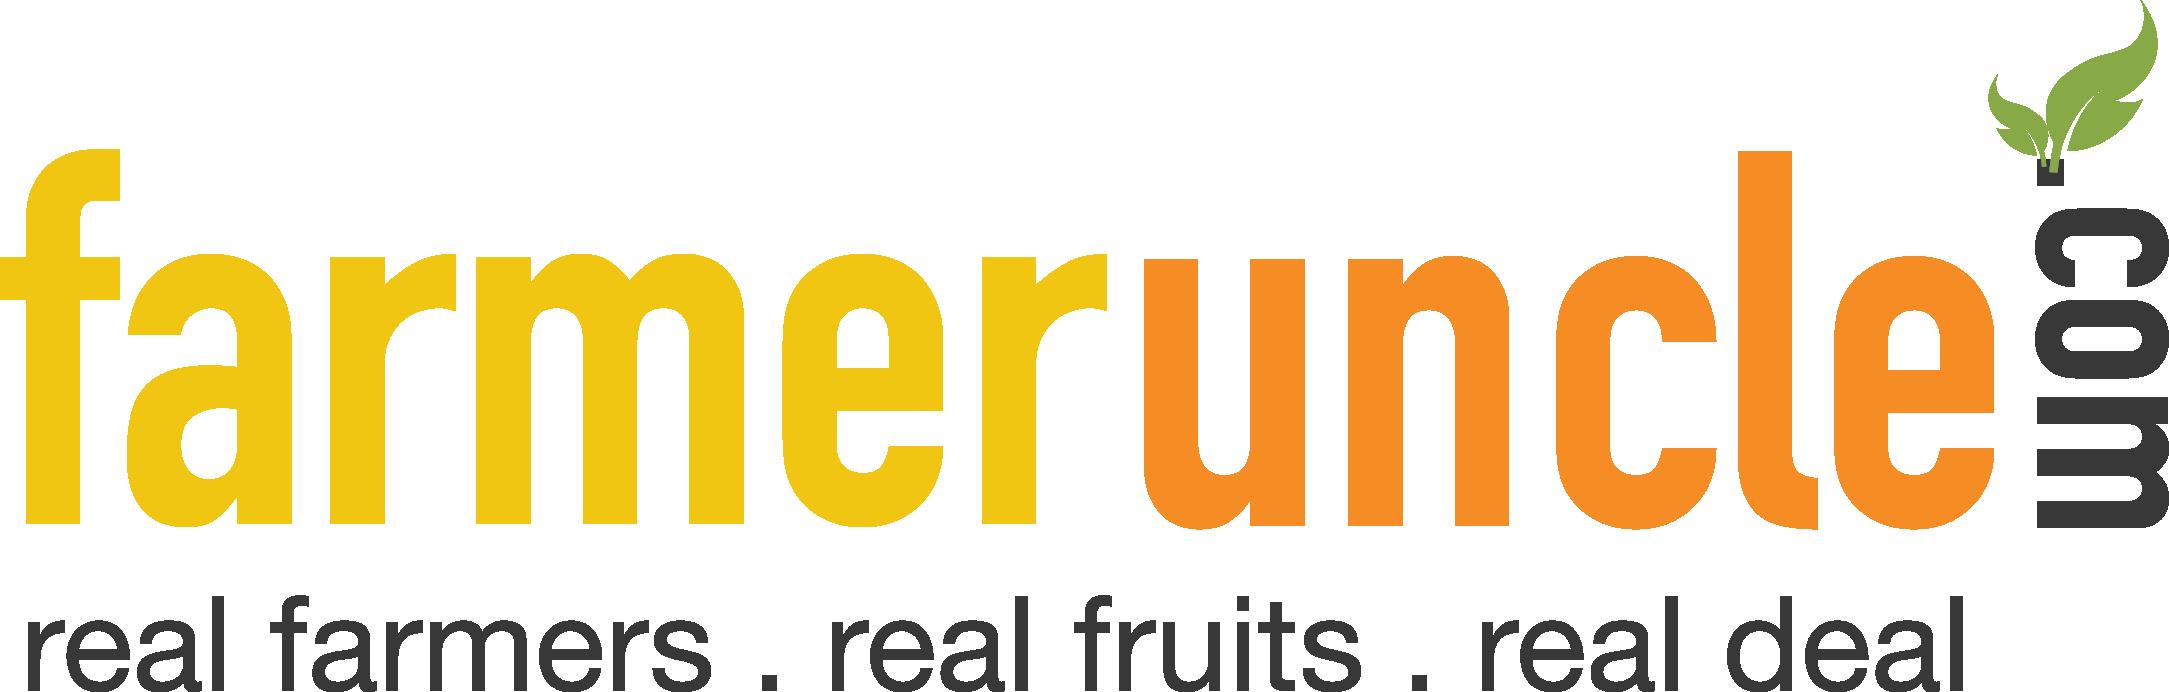 FARMERUNCLE - 971110075 - www.farmeruncle.com - logo